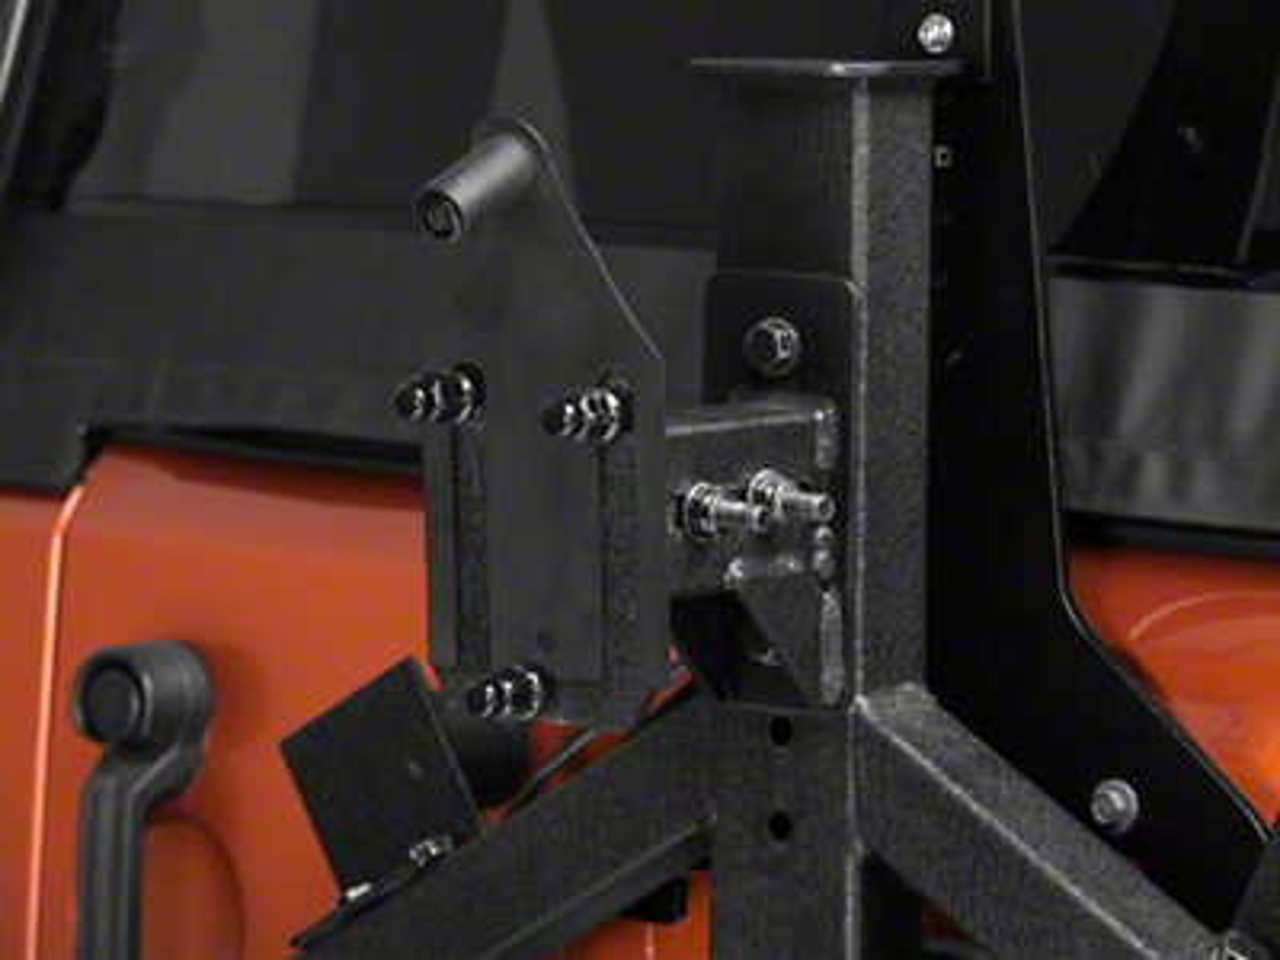 Raxiom Factory GPS Rear Back-up Camera Kit (07-17 Wrangler JK)